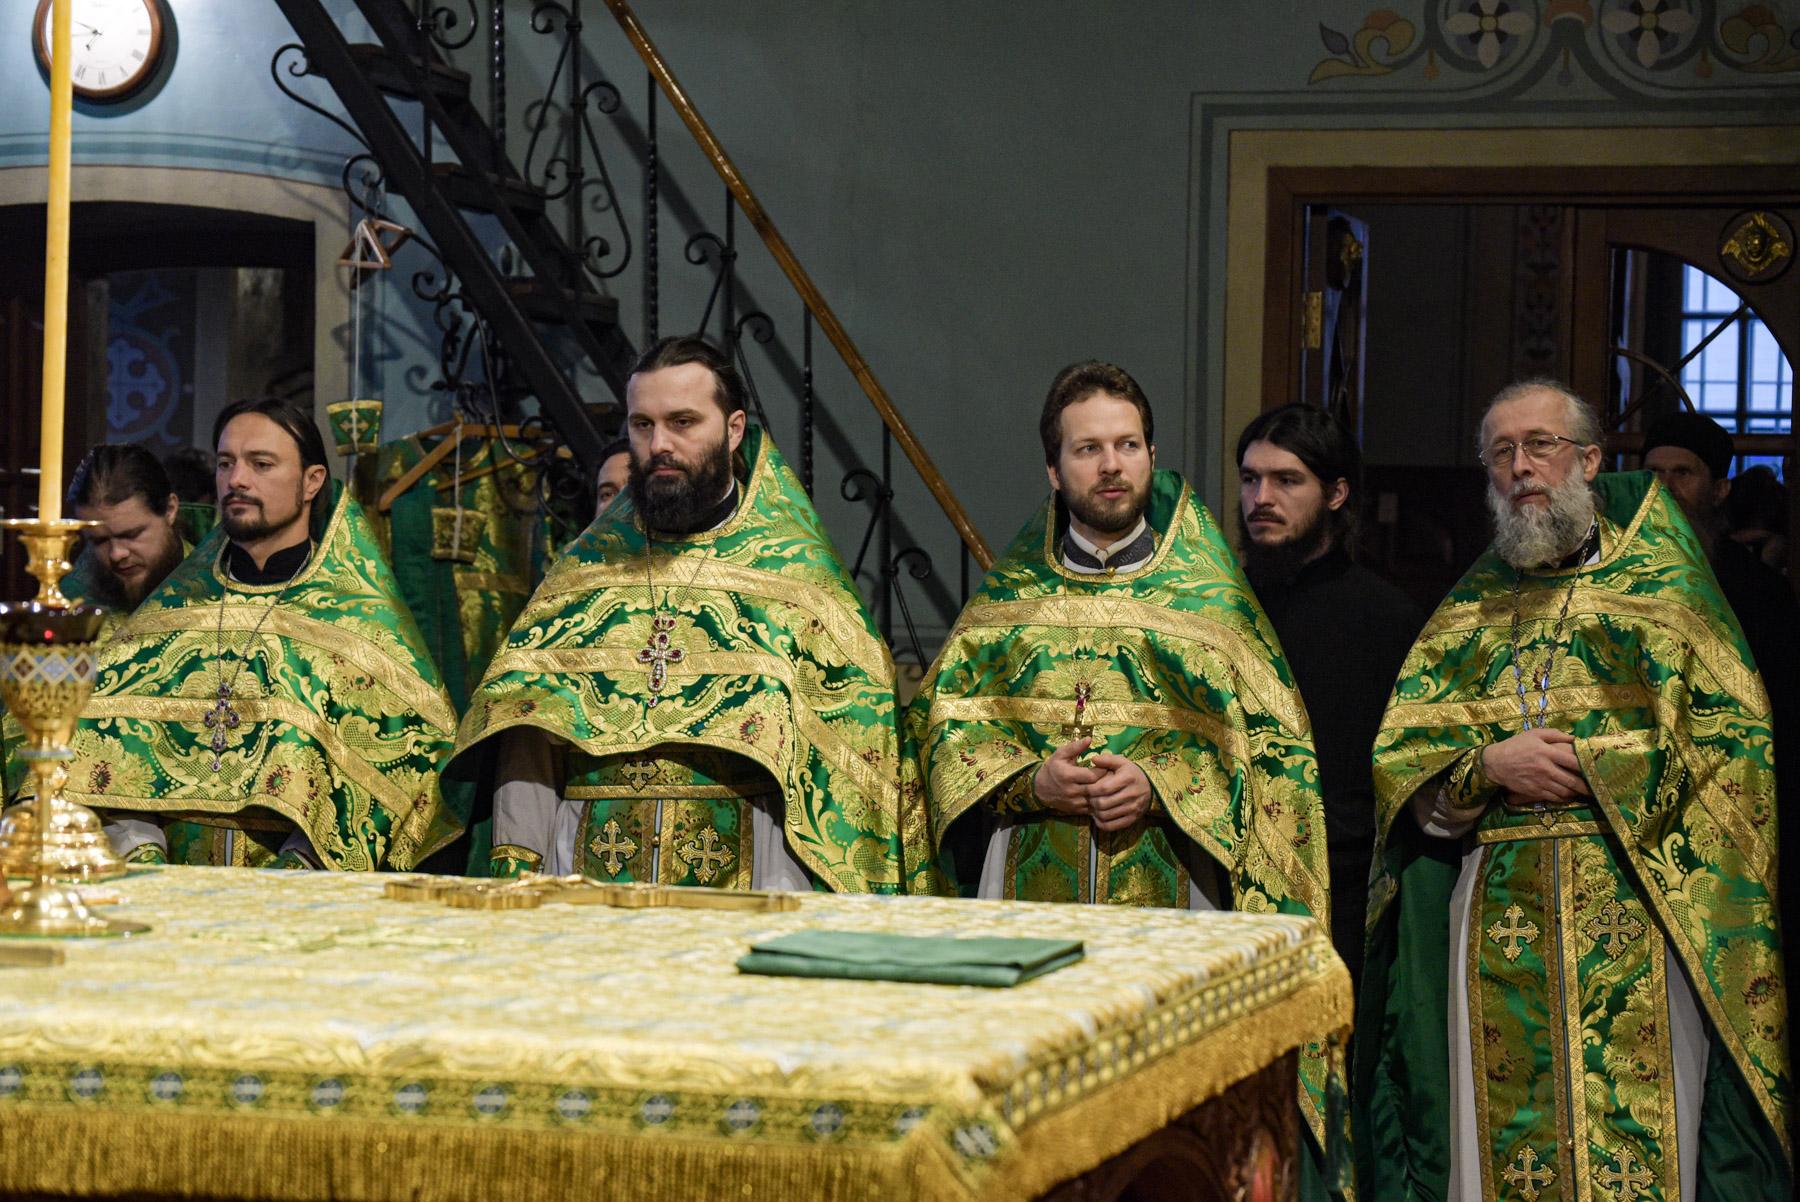 photos of orthodox christmas 0131 2